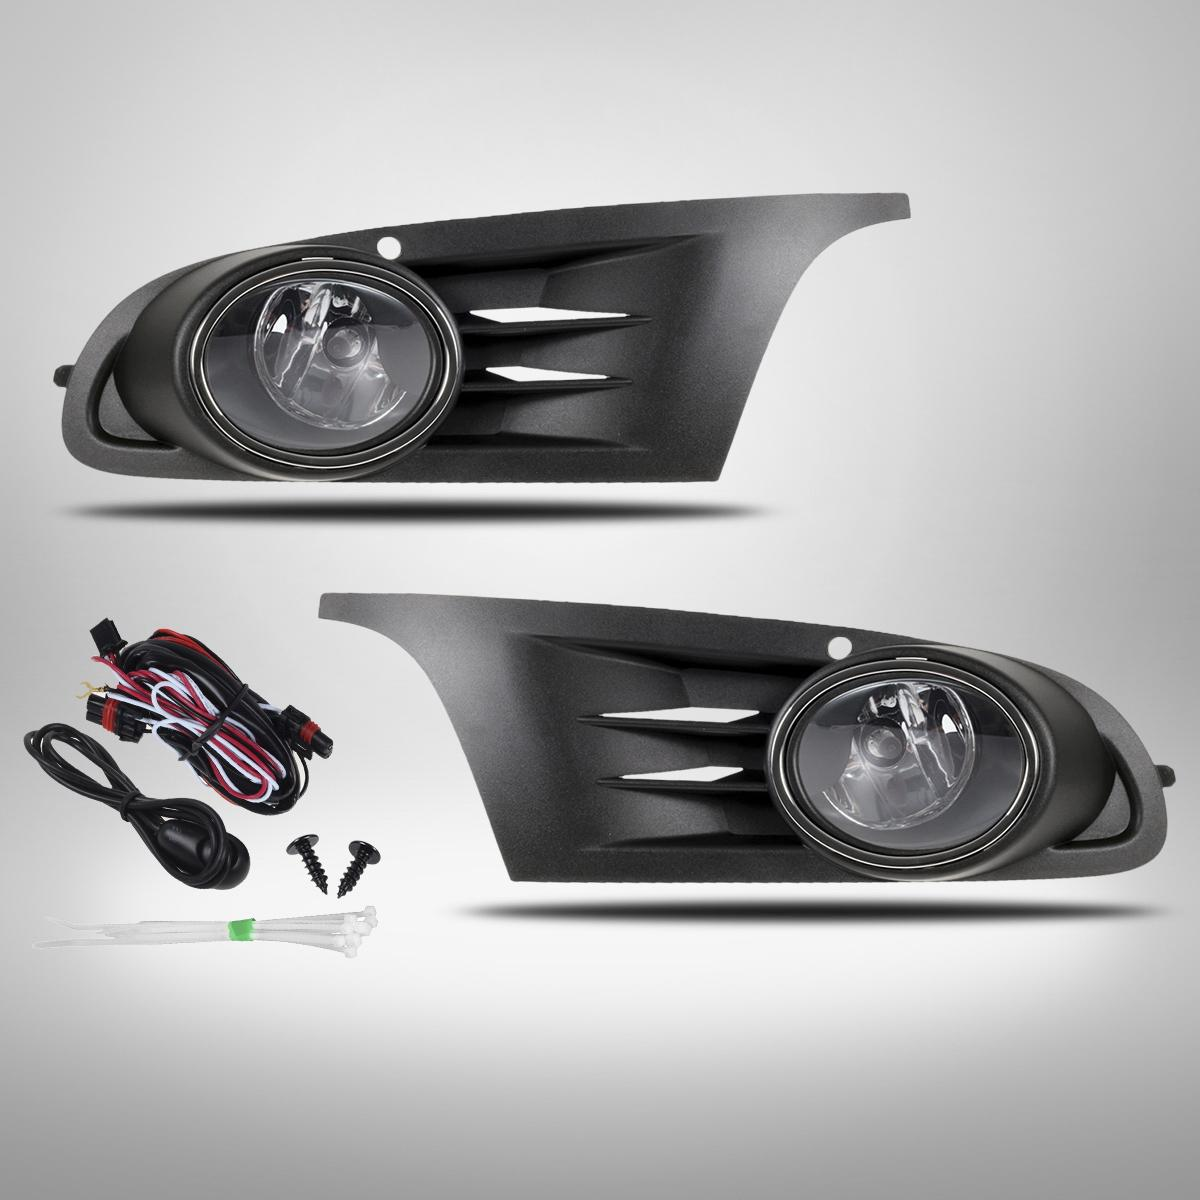 2015 Volkswagen Golf Sportwagen Suspension: Car Front Bumper Grille & Pair Fog Driving Light For 2010